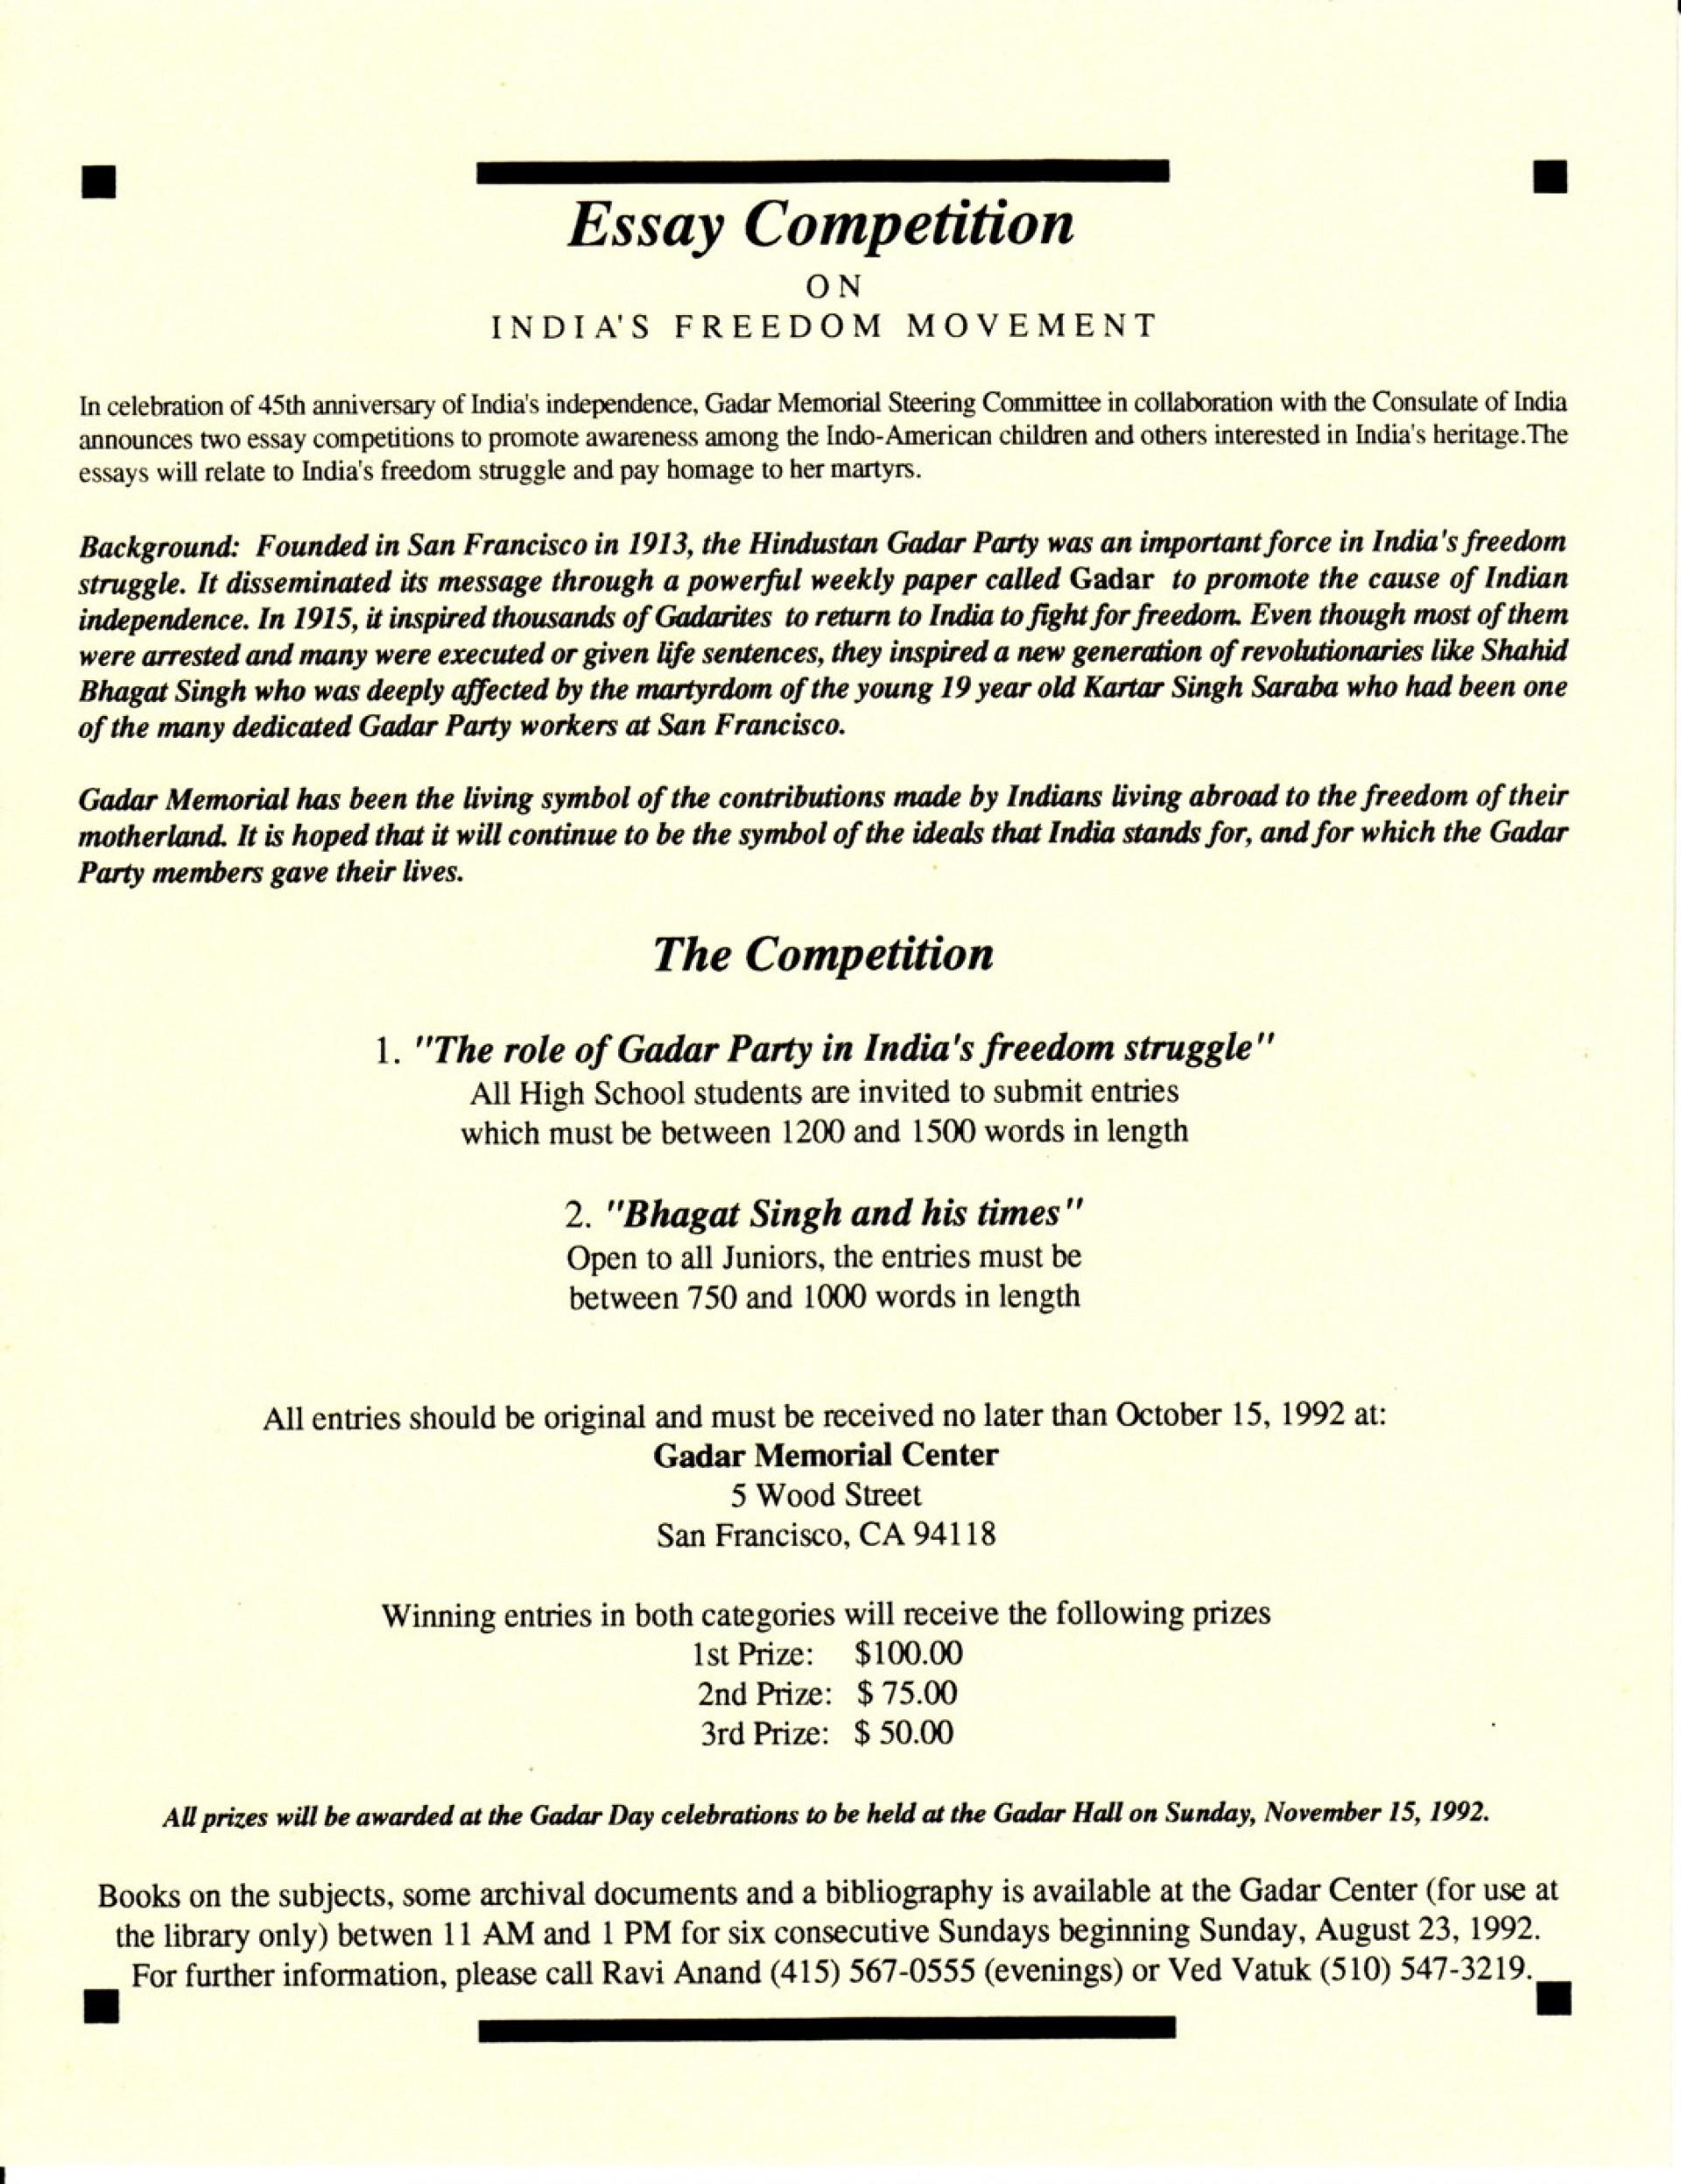 012 Essay Example Freedom Item Sjsu Breathtaking Cry Topics Contest Sertoma Club 1920